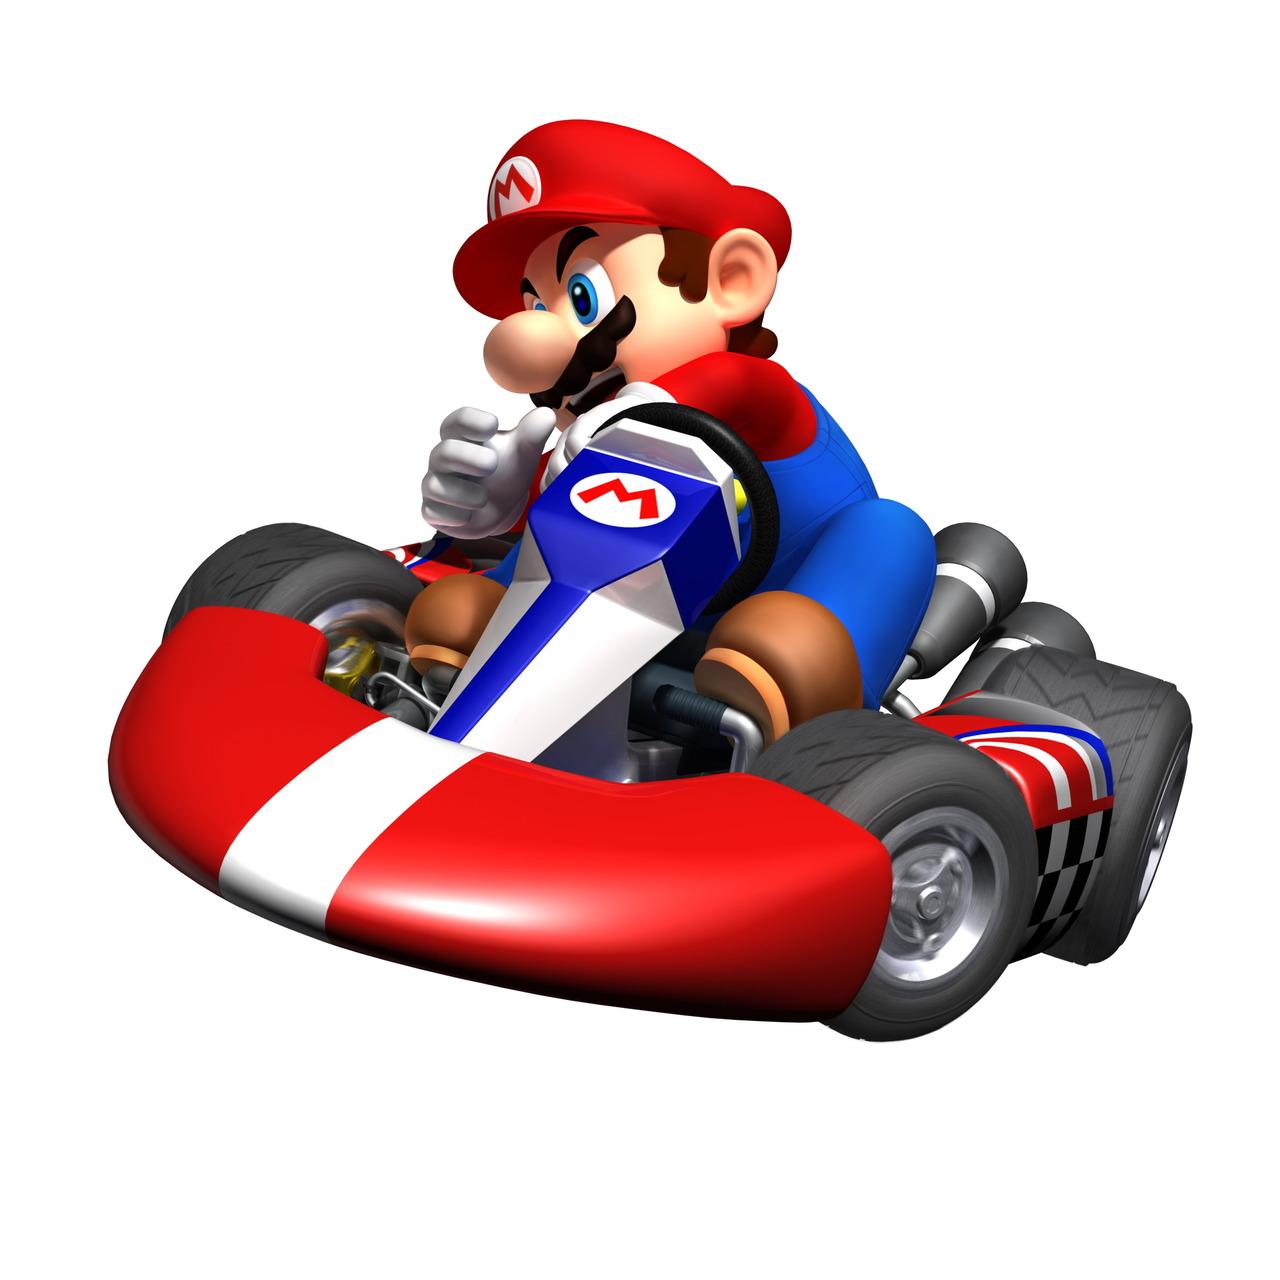 jeuxvideo.com Mario Kart Wii - Wii Image 355 sur 362